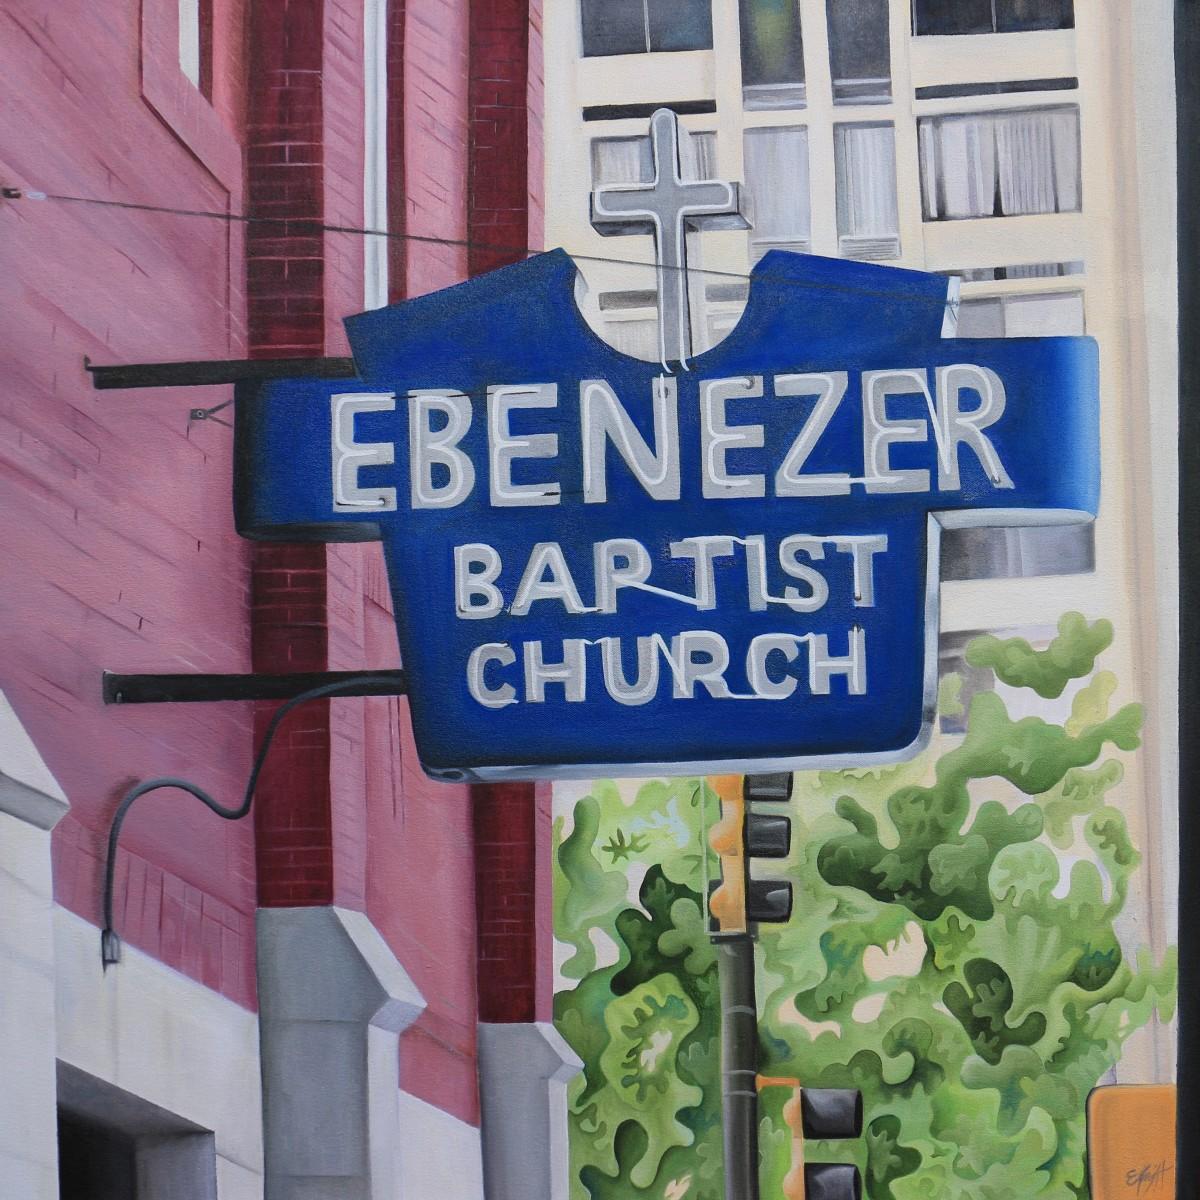 Ebenezer Baptist Church